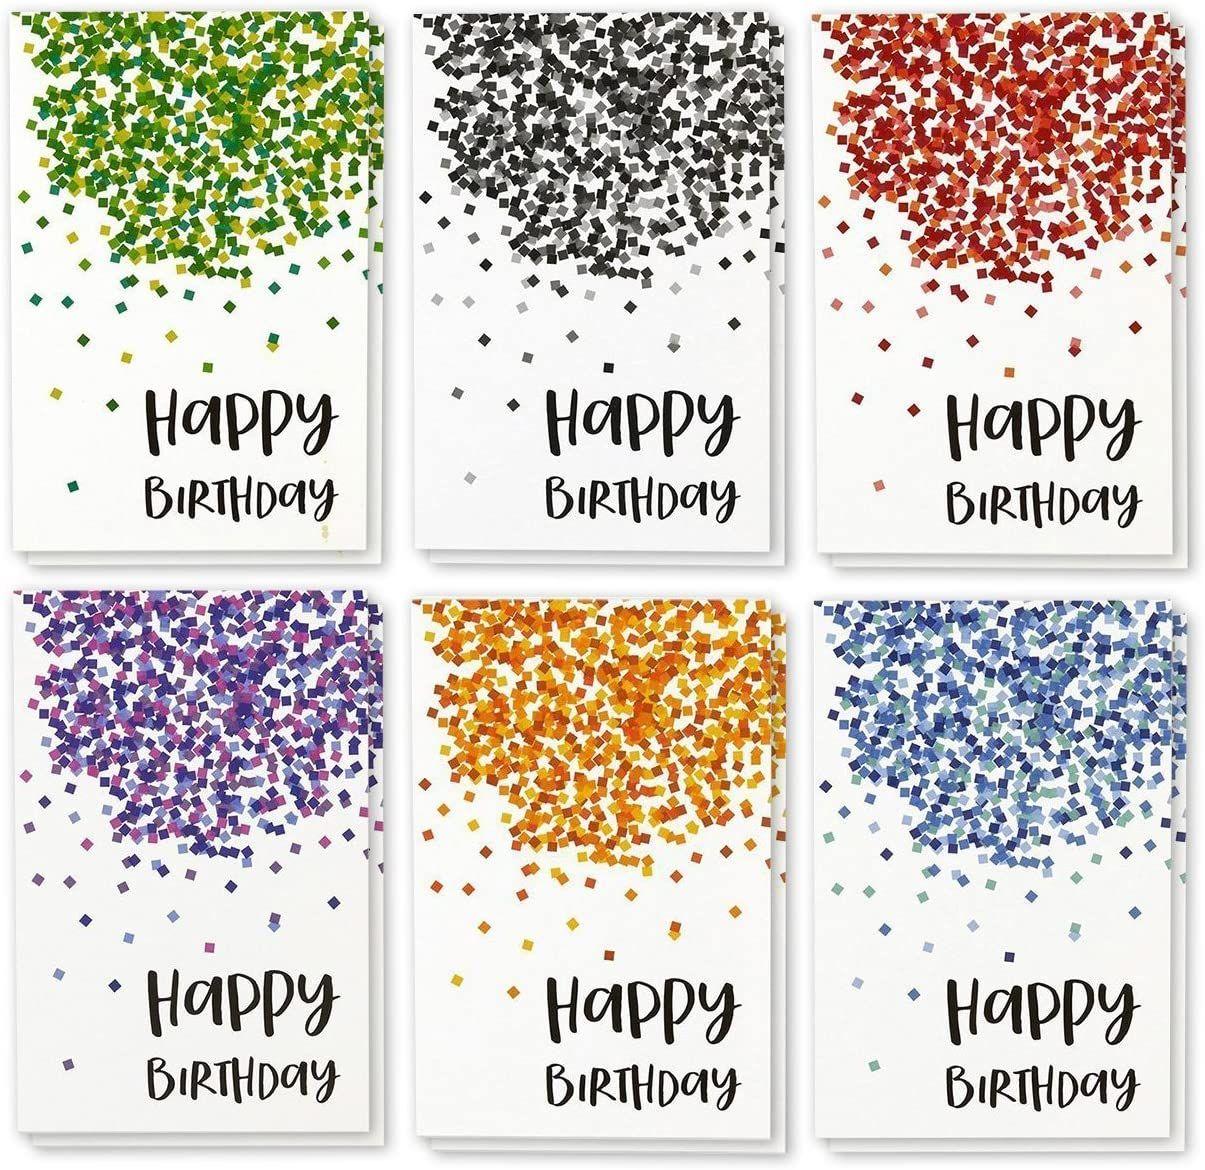 10 New Ideas Amazon Happy Birthday Card In 2021 Happy Birthday Greeting Card Happy Birthday Cards Birthday Greeting Cards